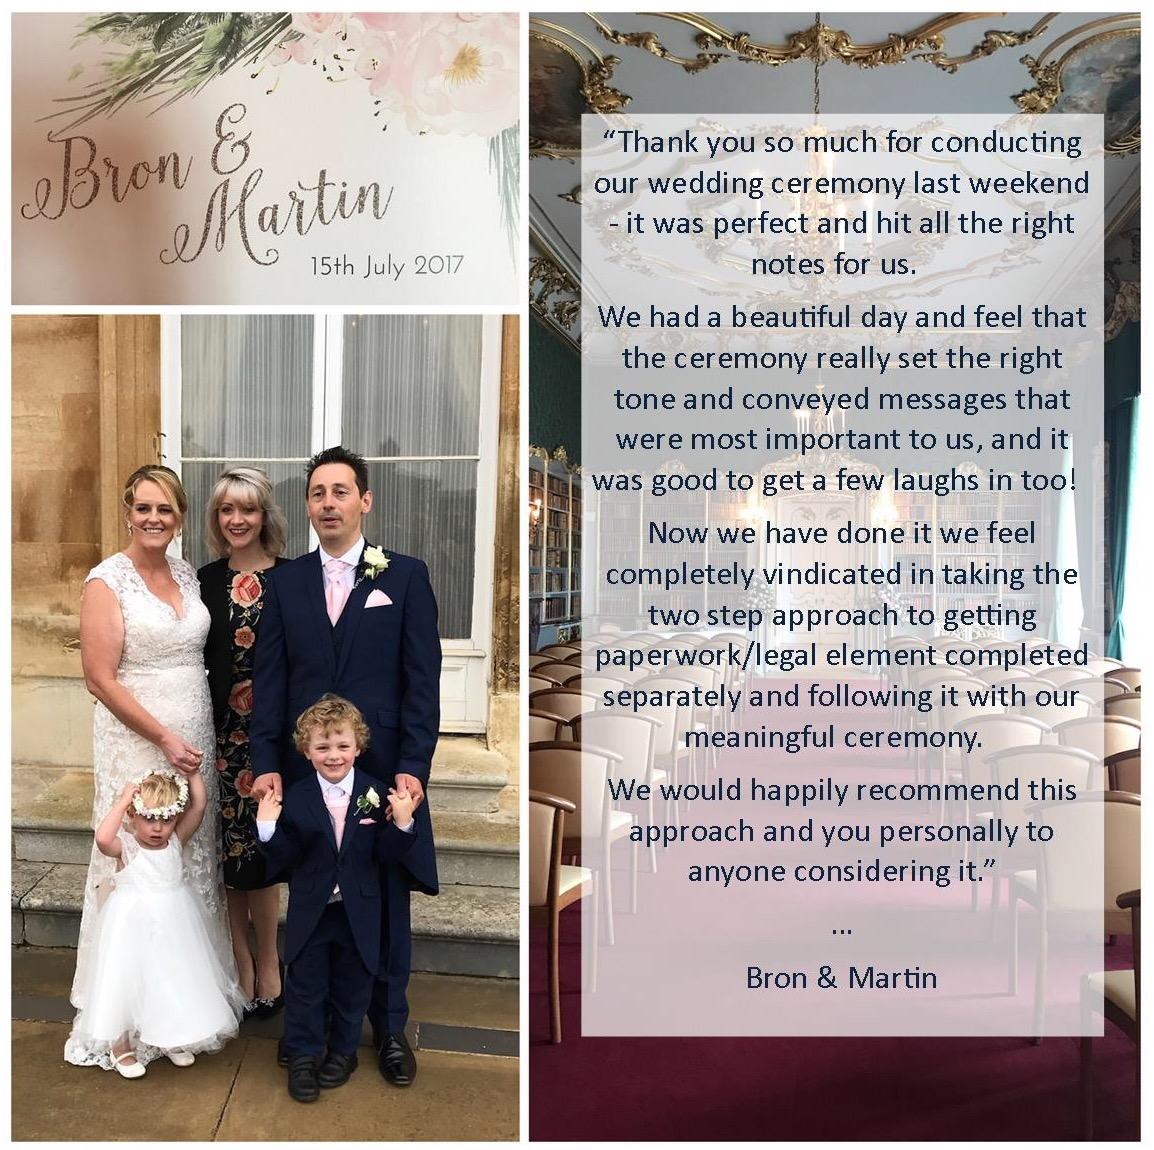 Martin and Bron wedding testimonial celebrant ceremony at Wrest Park